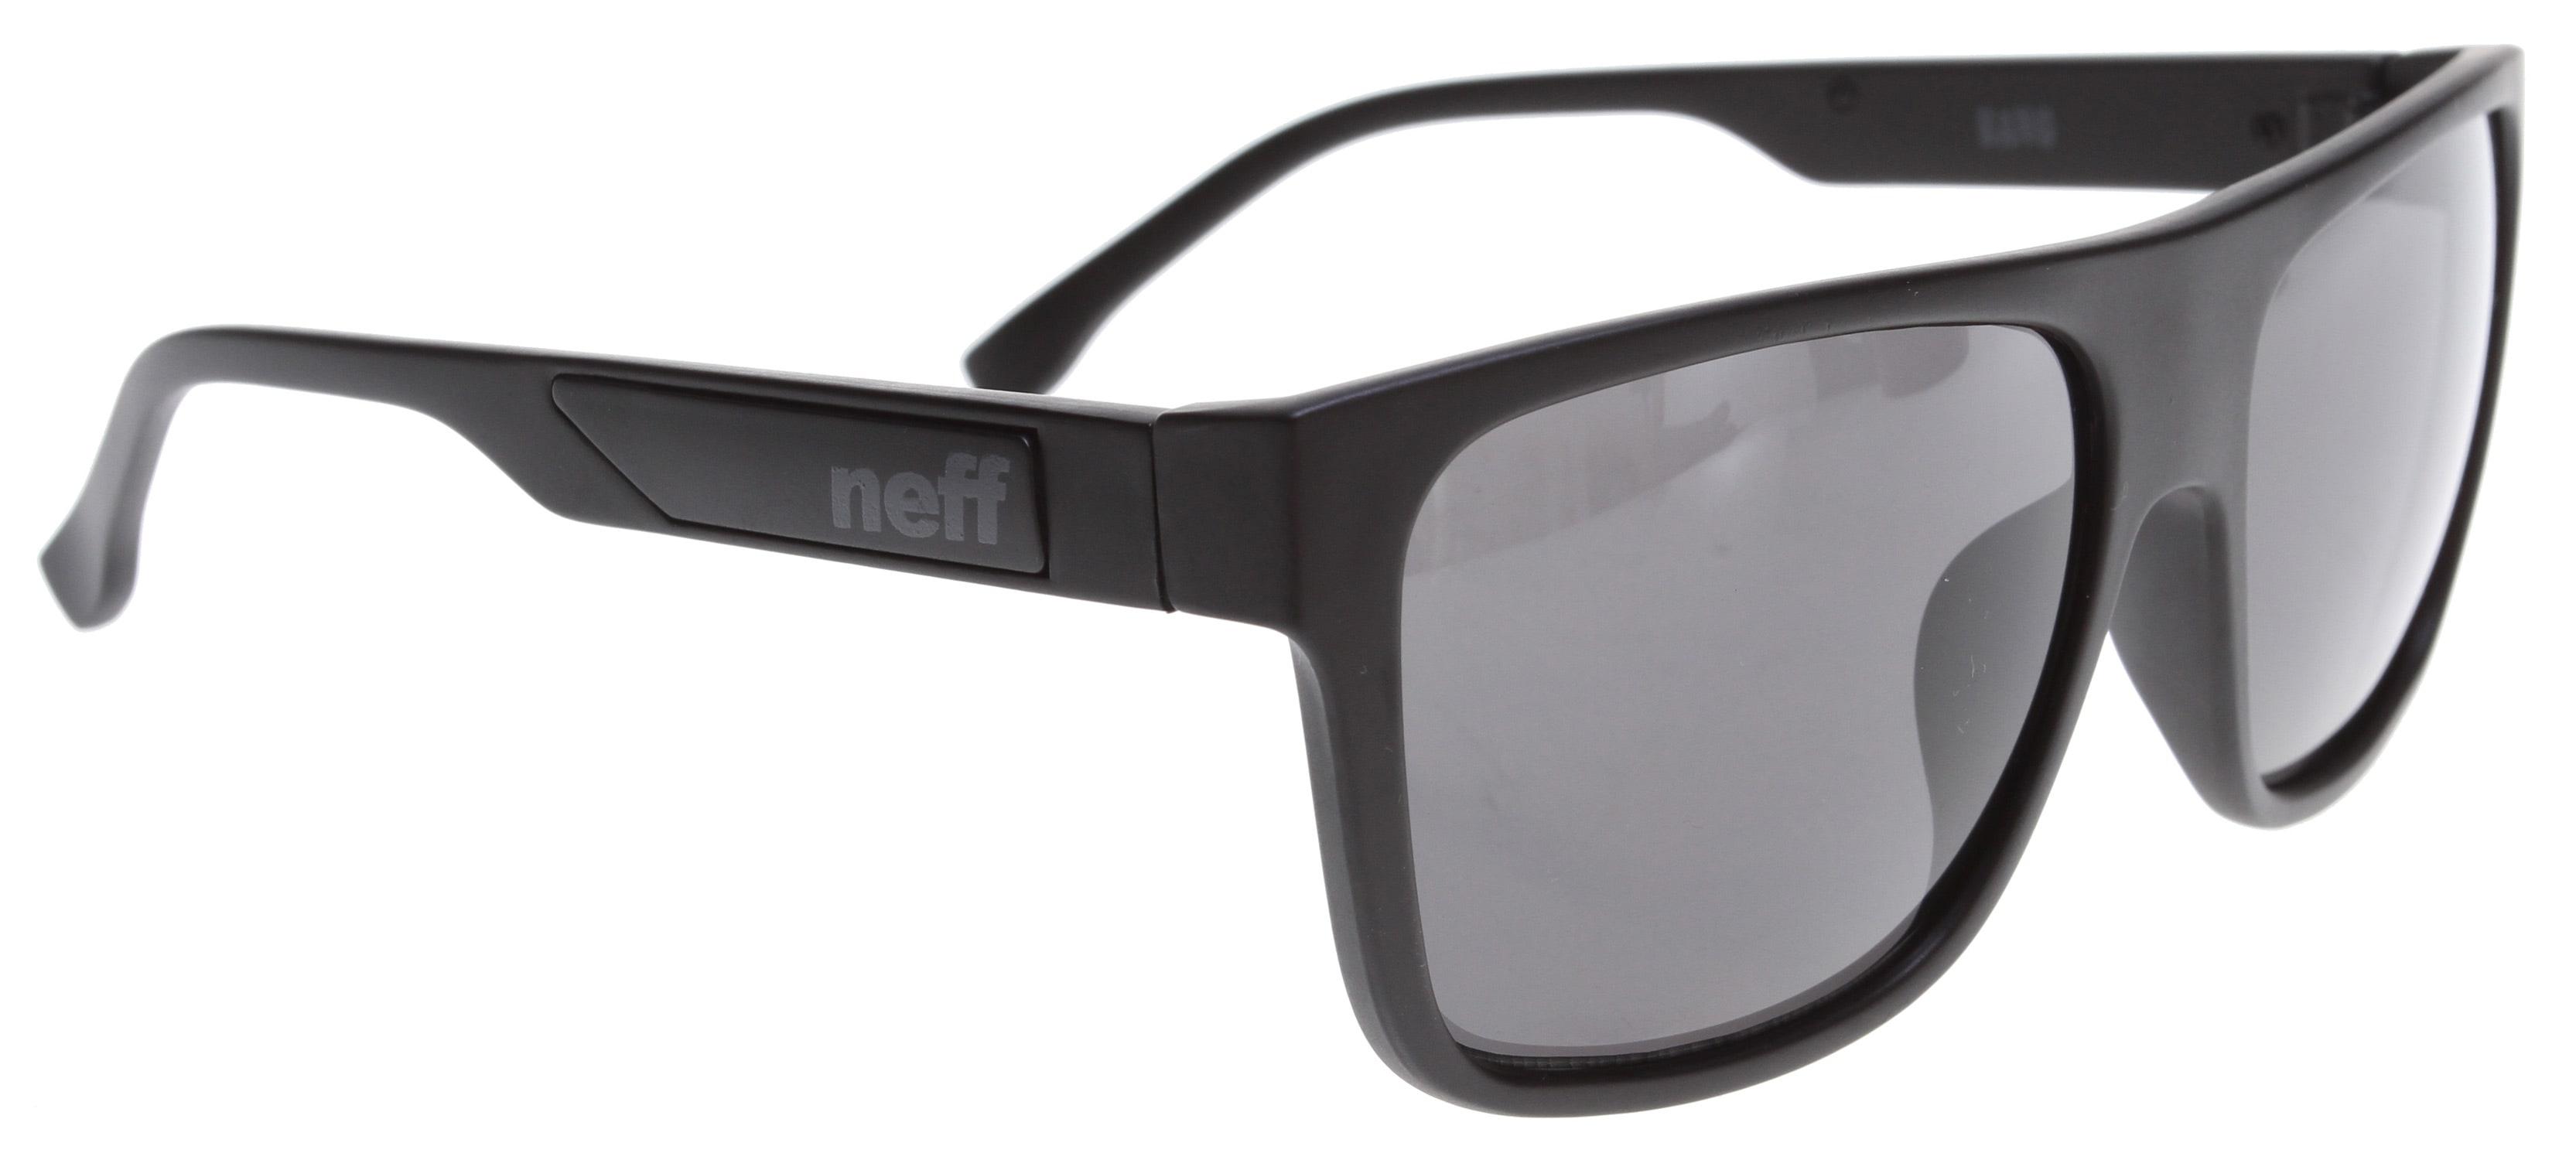 black aviator sunglasses  bang sunglasses